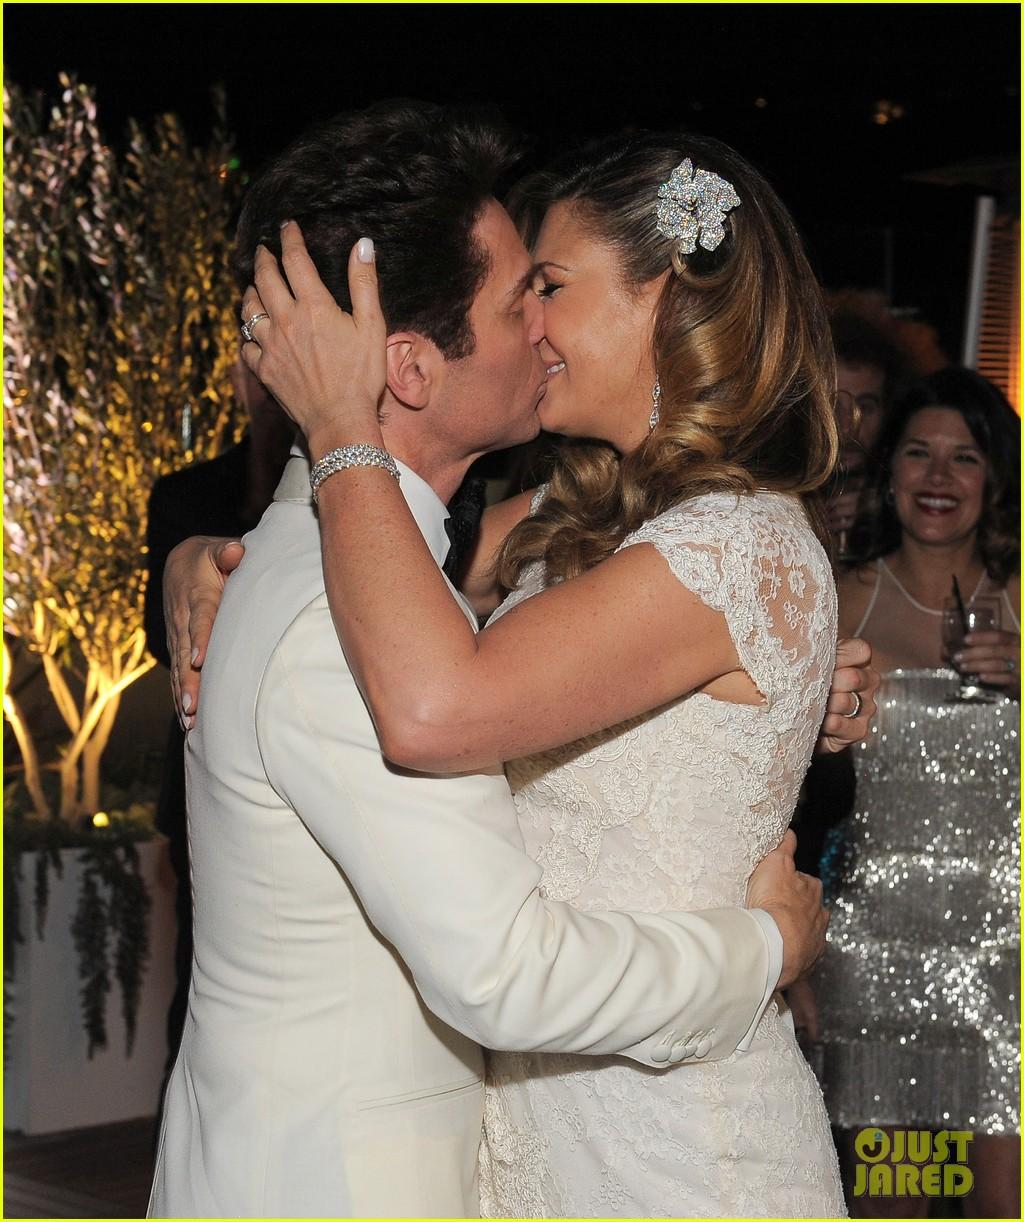 daisy fuentes richard marx get married again 043569687